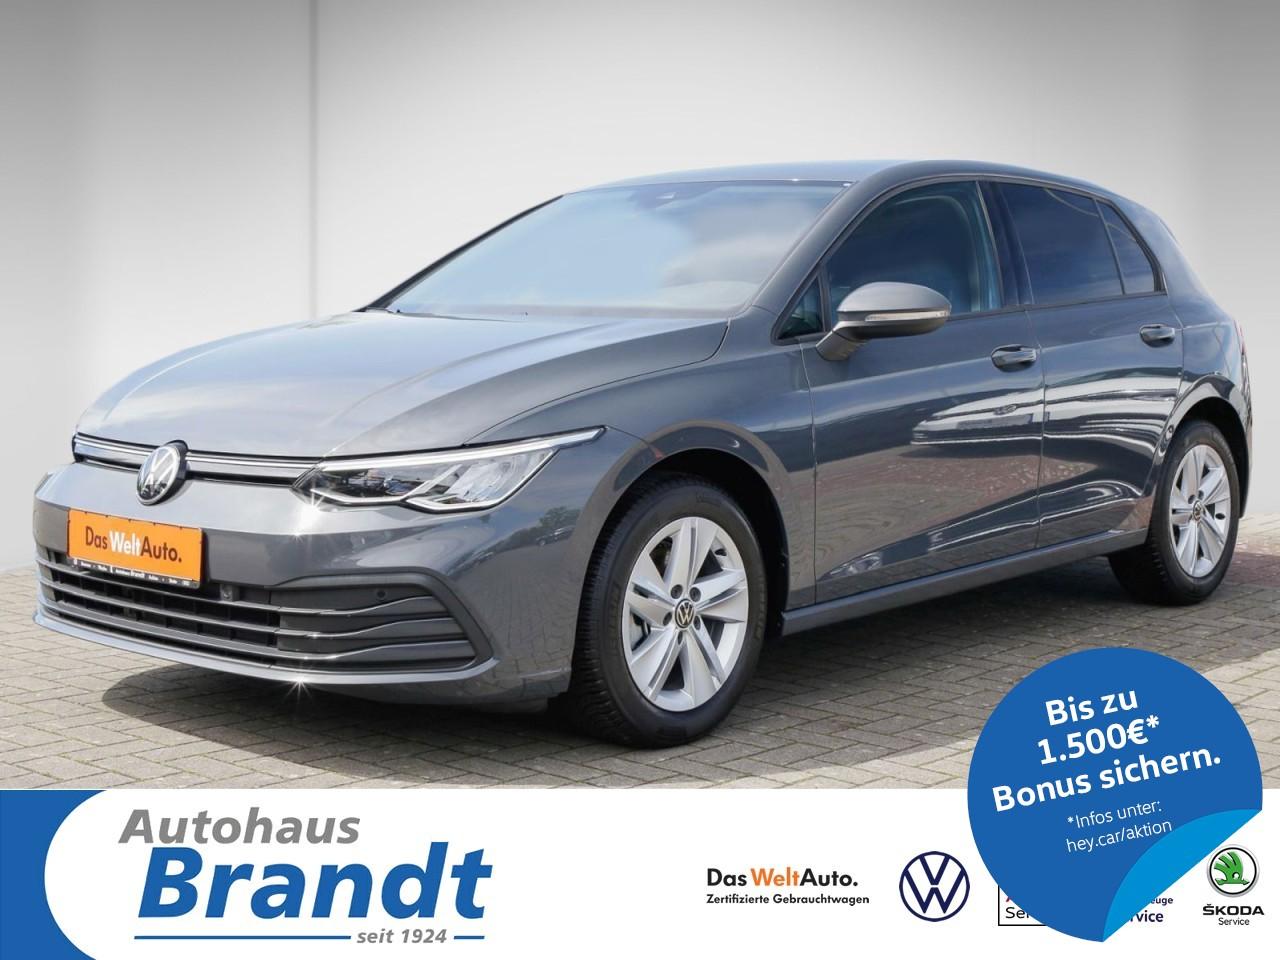 Volkswagen Golf VIII 2.0 TDI Life DSG*LED*NAVI*ACC*DIGITAL COCKPIT, Jahr 2020, Diesel